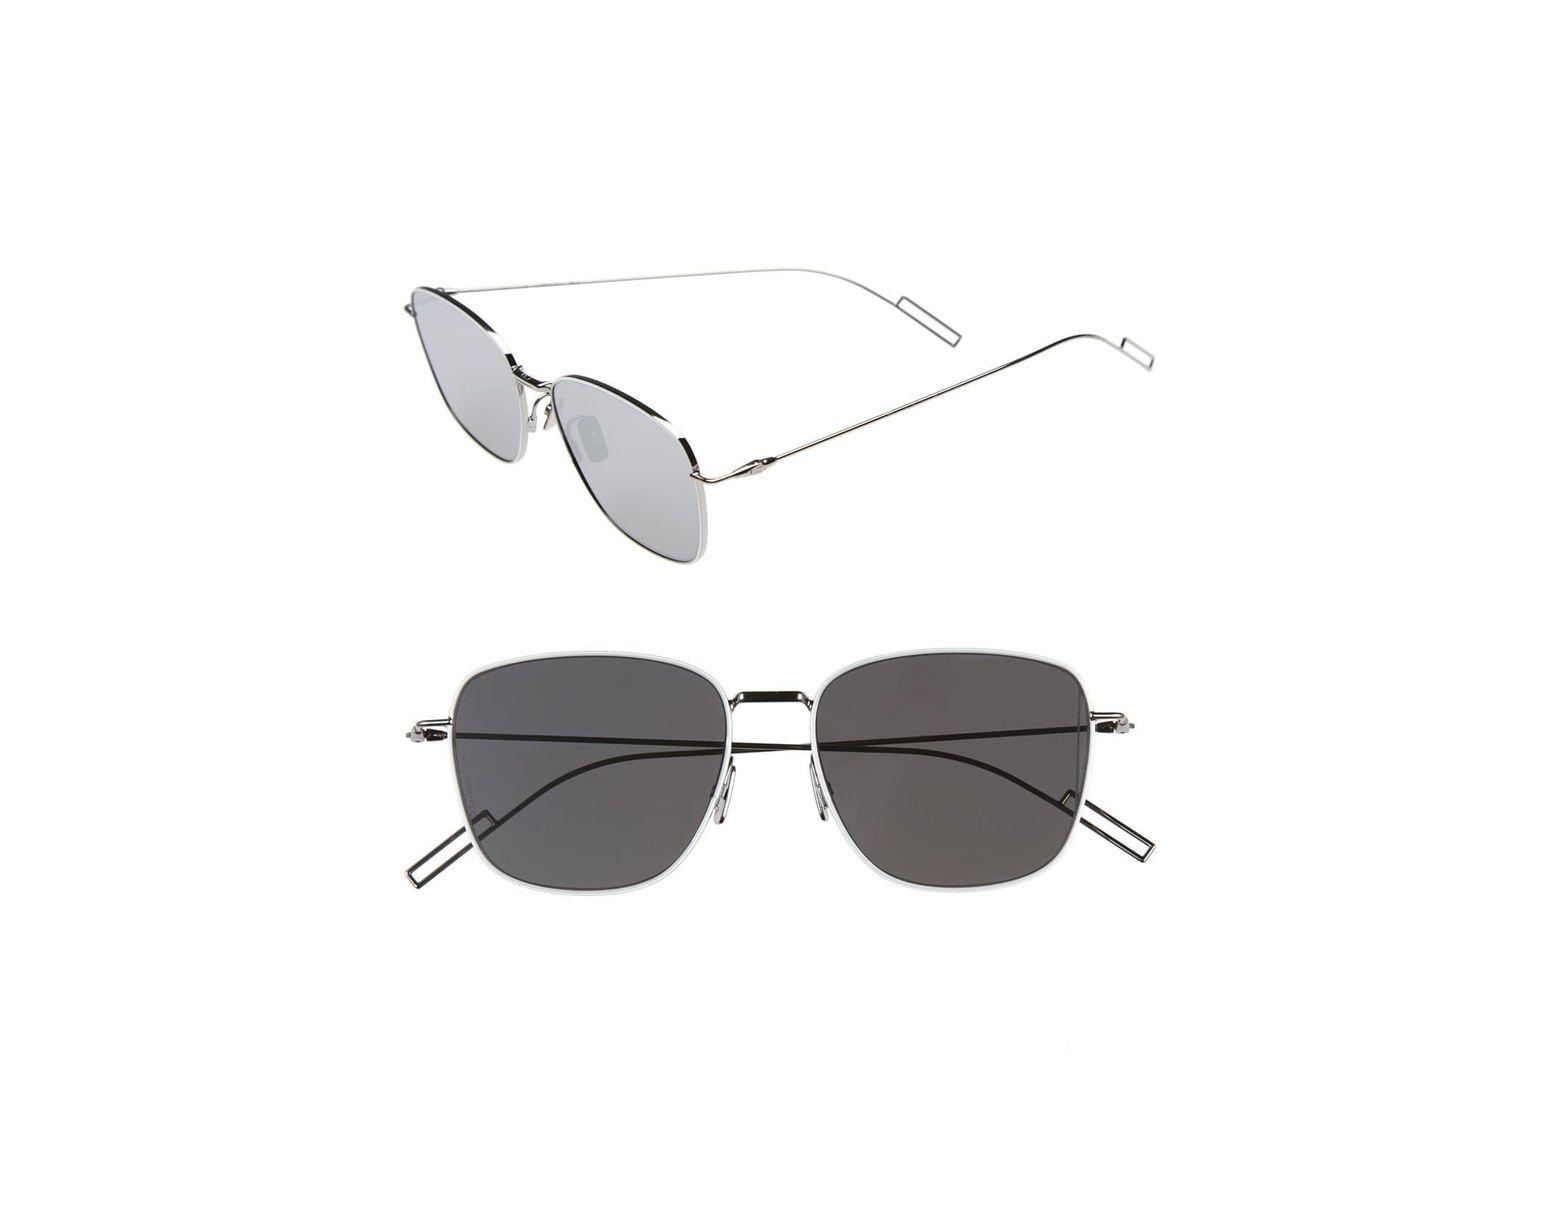 2f930f1d4ee6 Dior 'composit 1.1s' 54mm Metal Sunglasses - Palladium/ Grey Silver Mirror  in Metallic for Men - Lyst